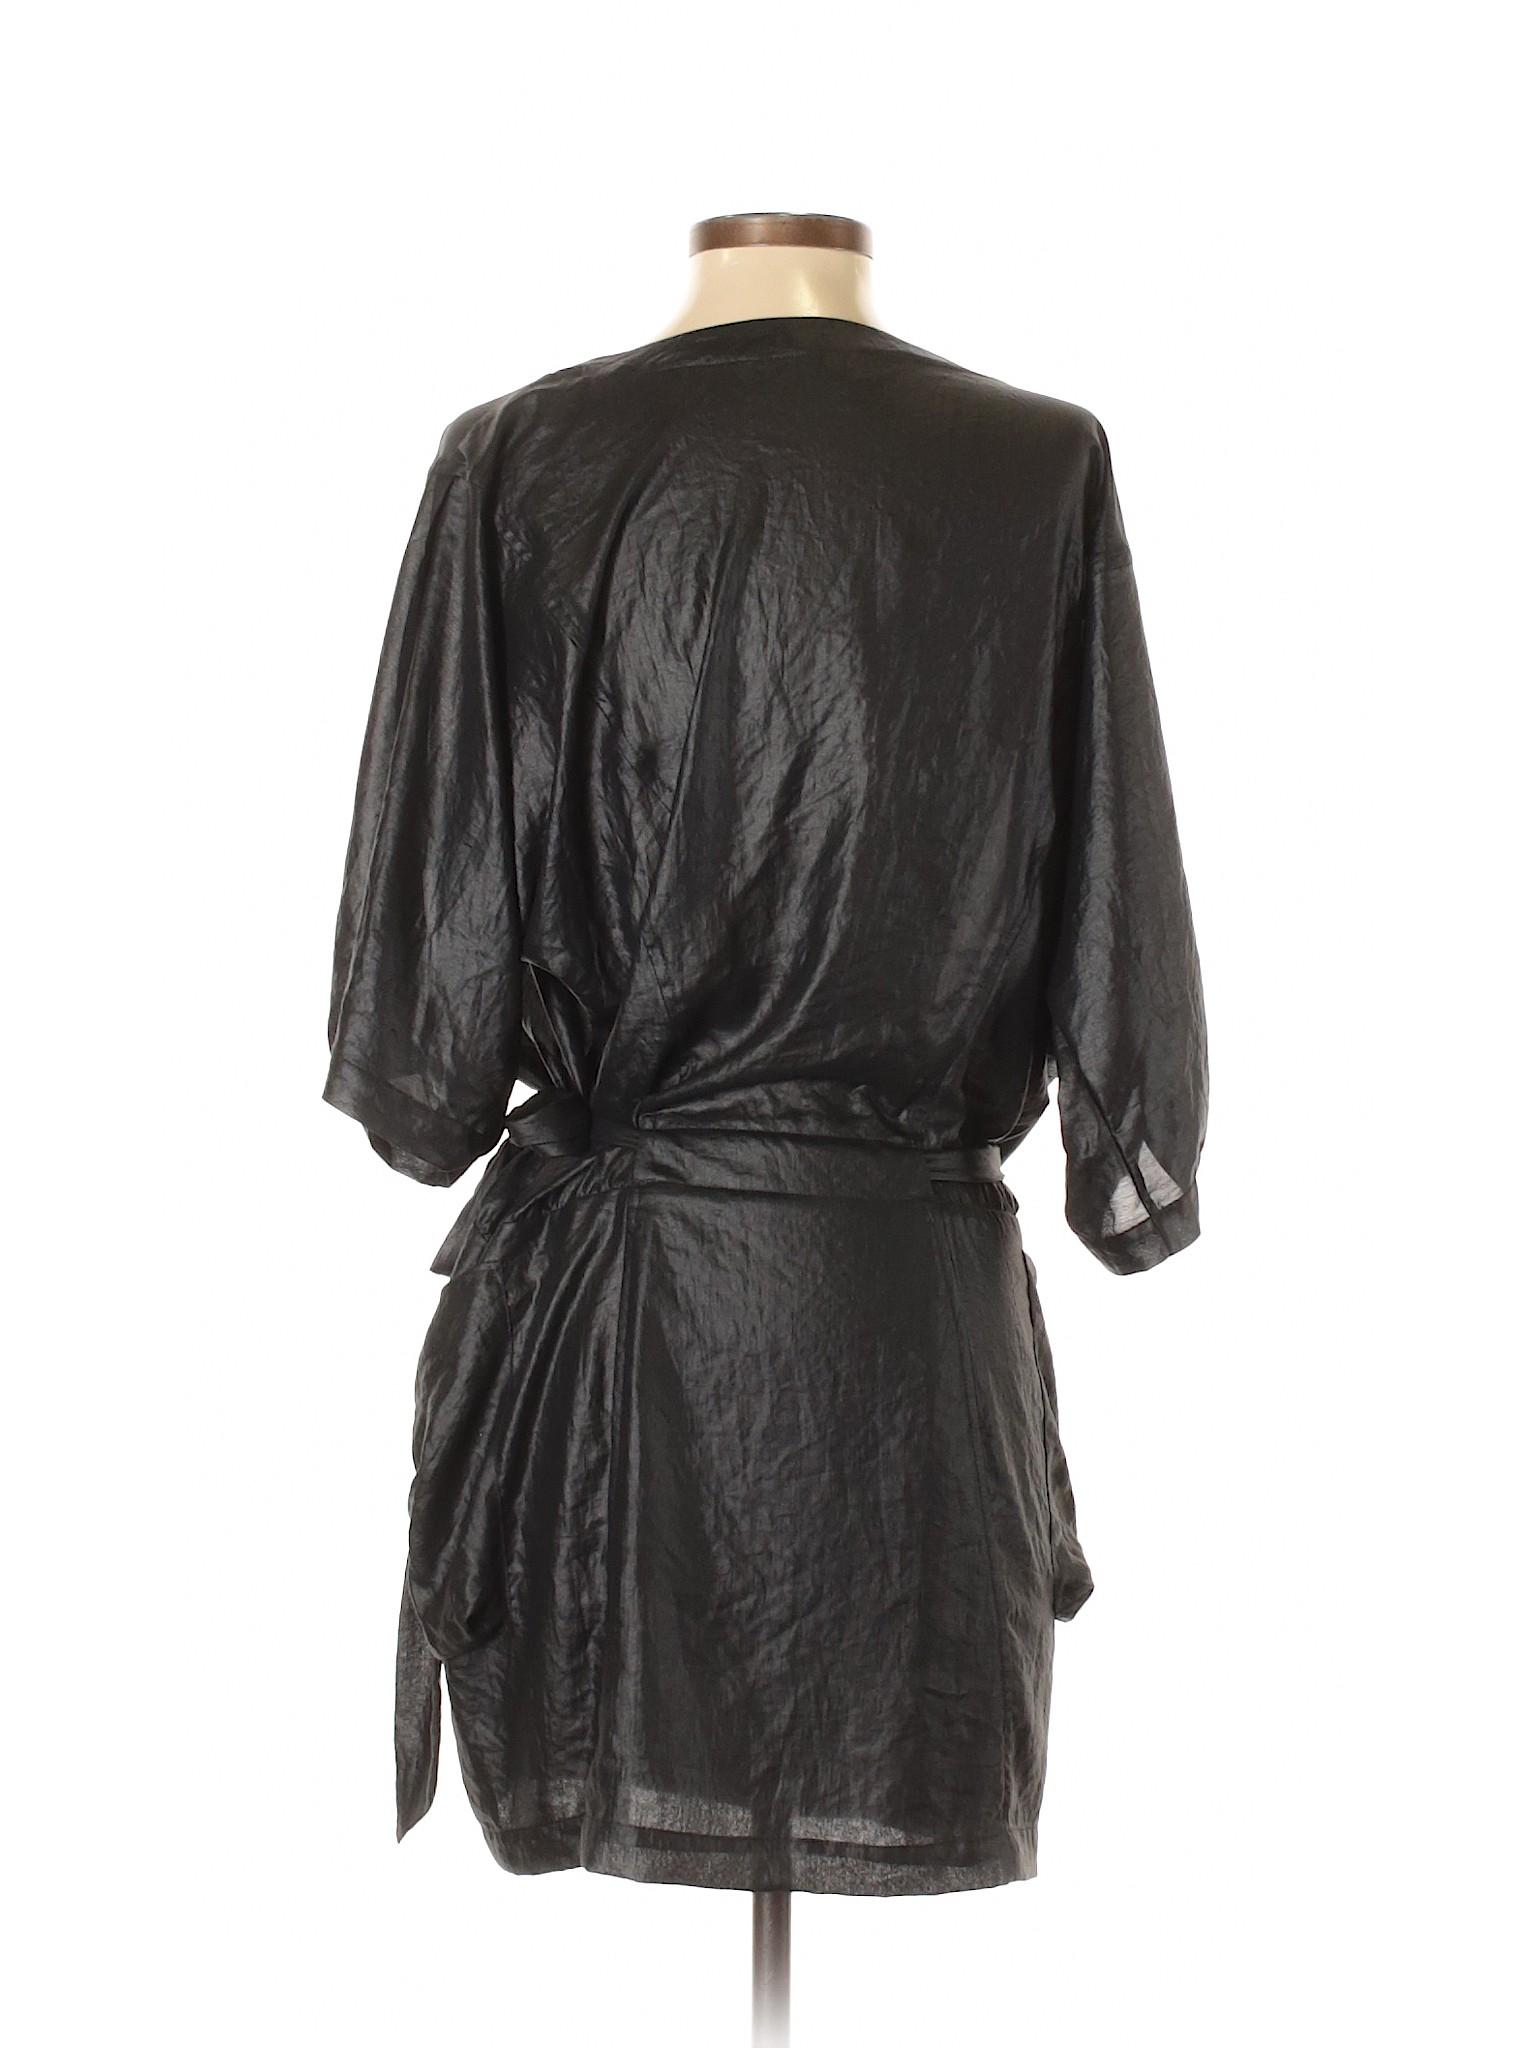 Dress Boutique winter winter Casual BCBGMAXAZRIA Boutique xOgzFwXqR